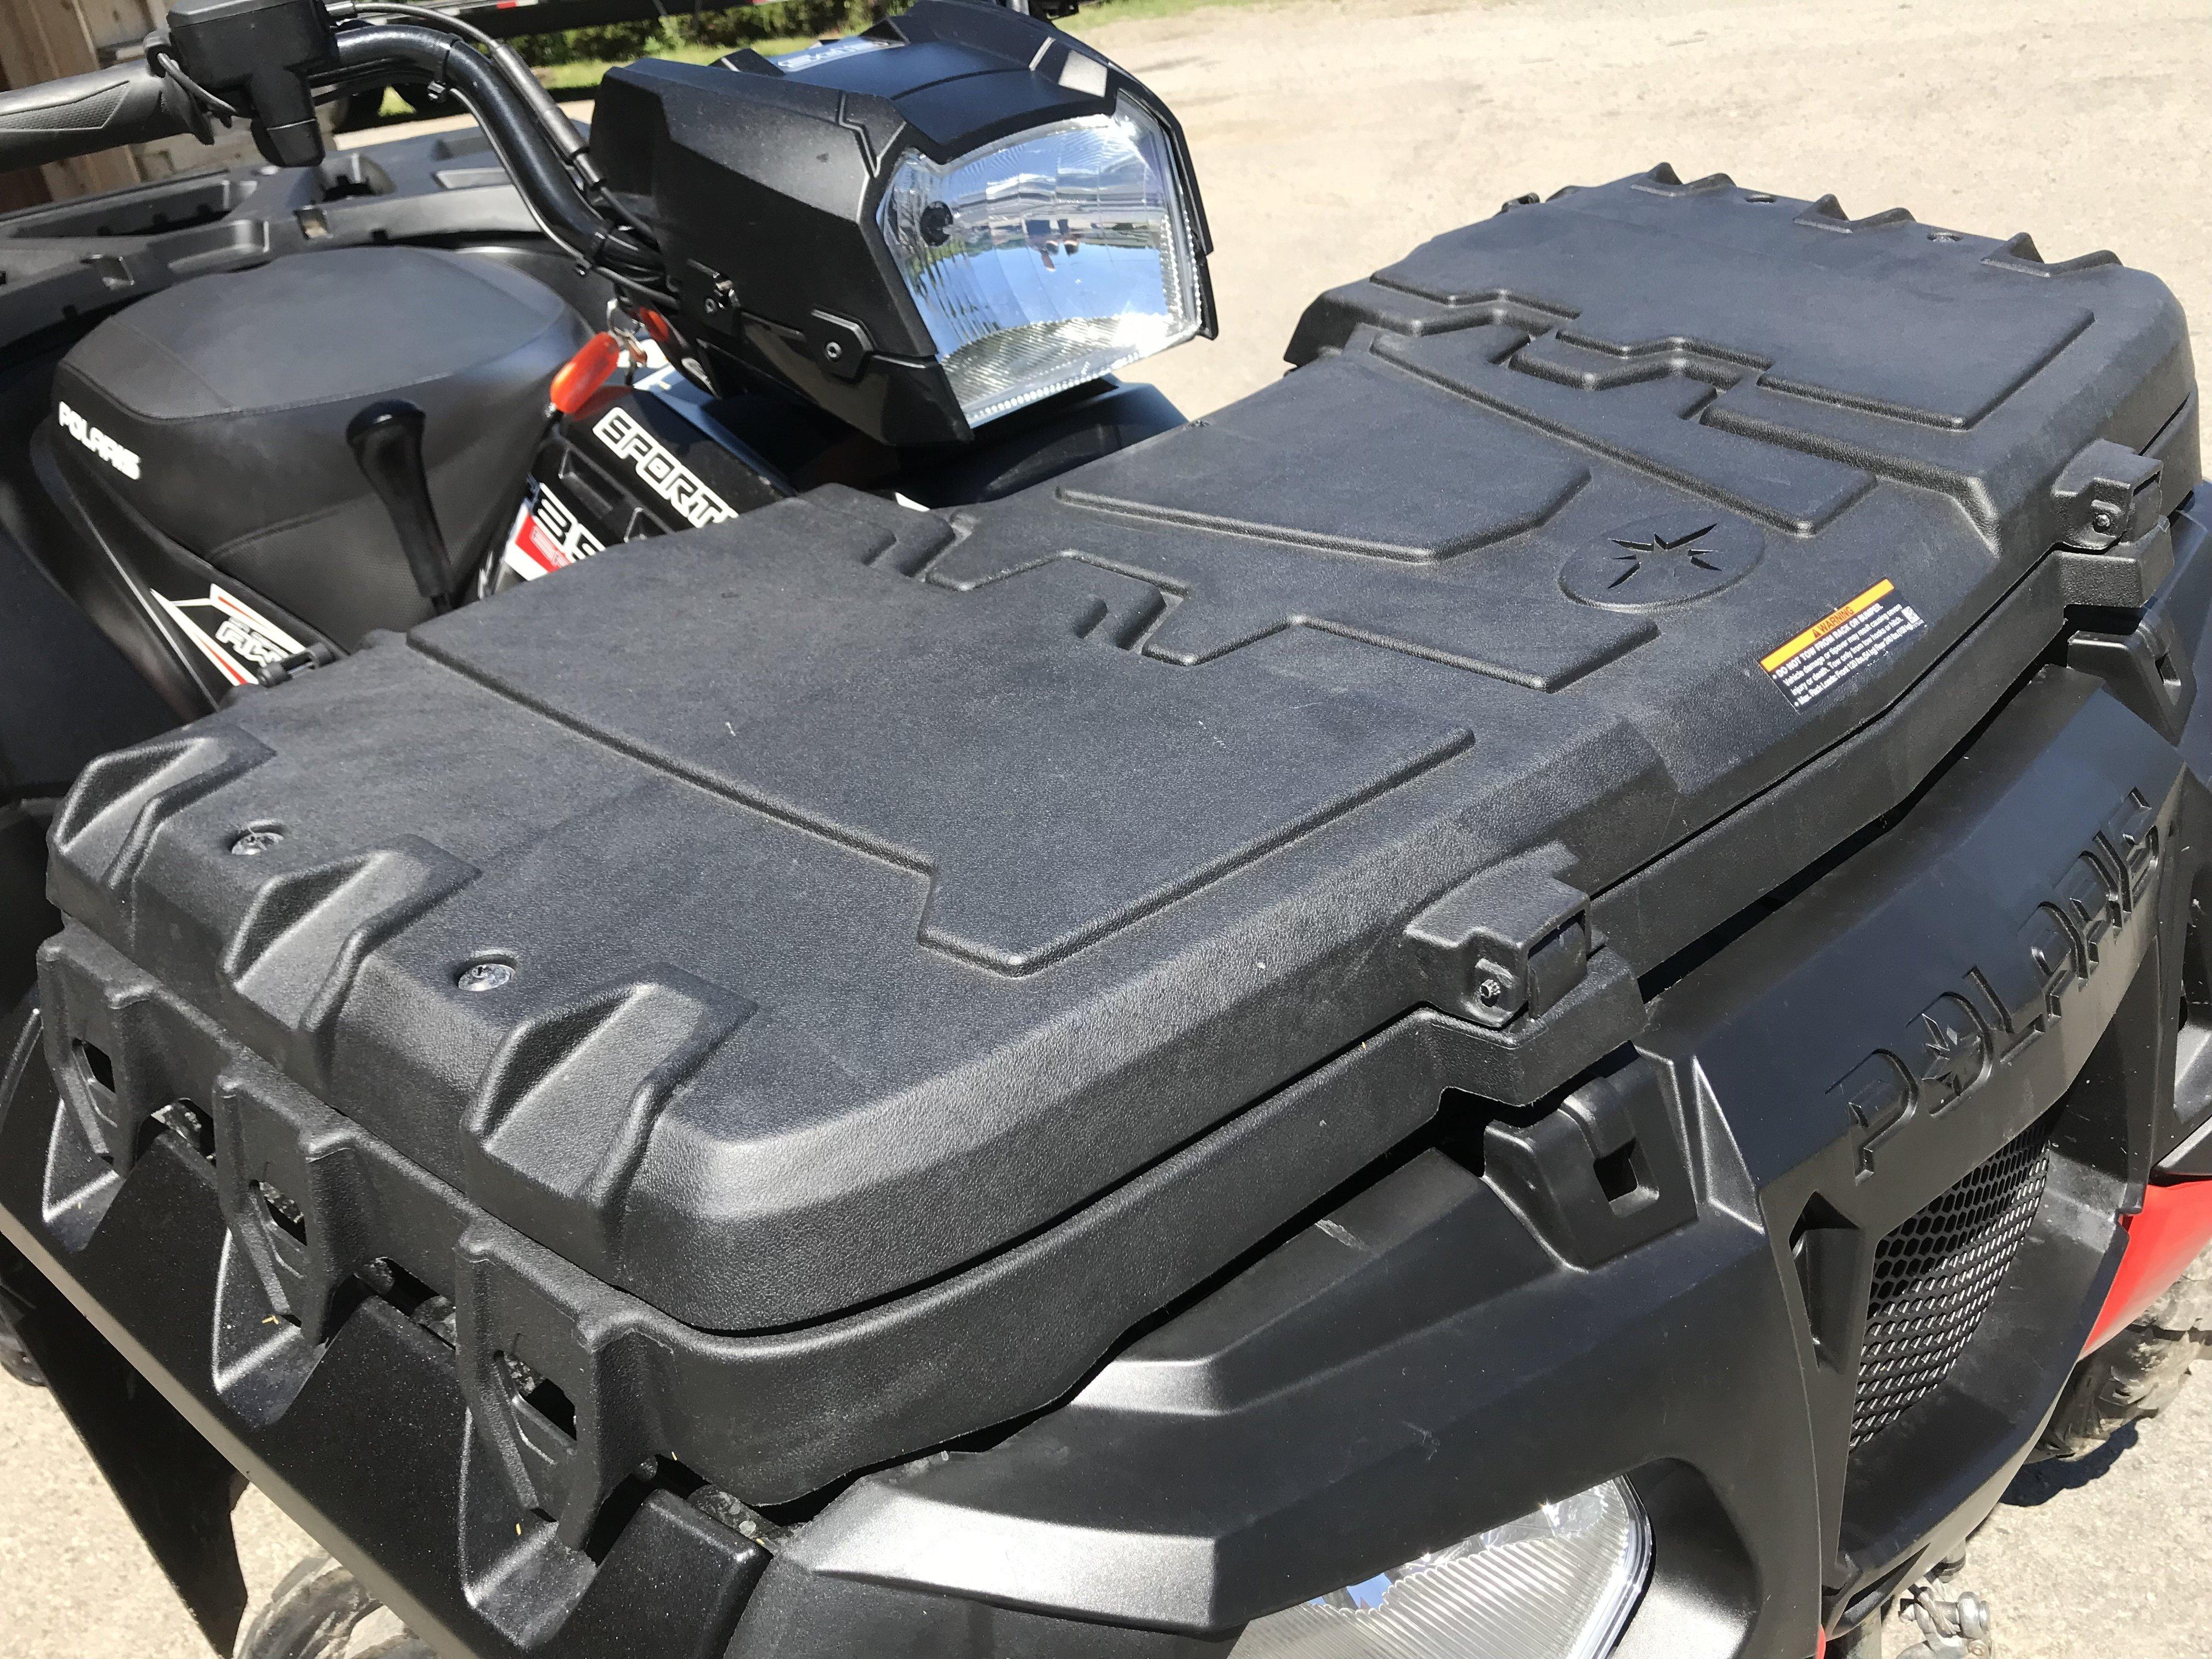 2013 Polaris Sportsman 850 XP LE EPS - Nearly New